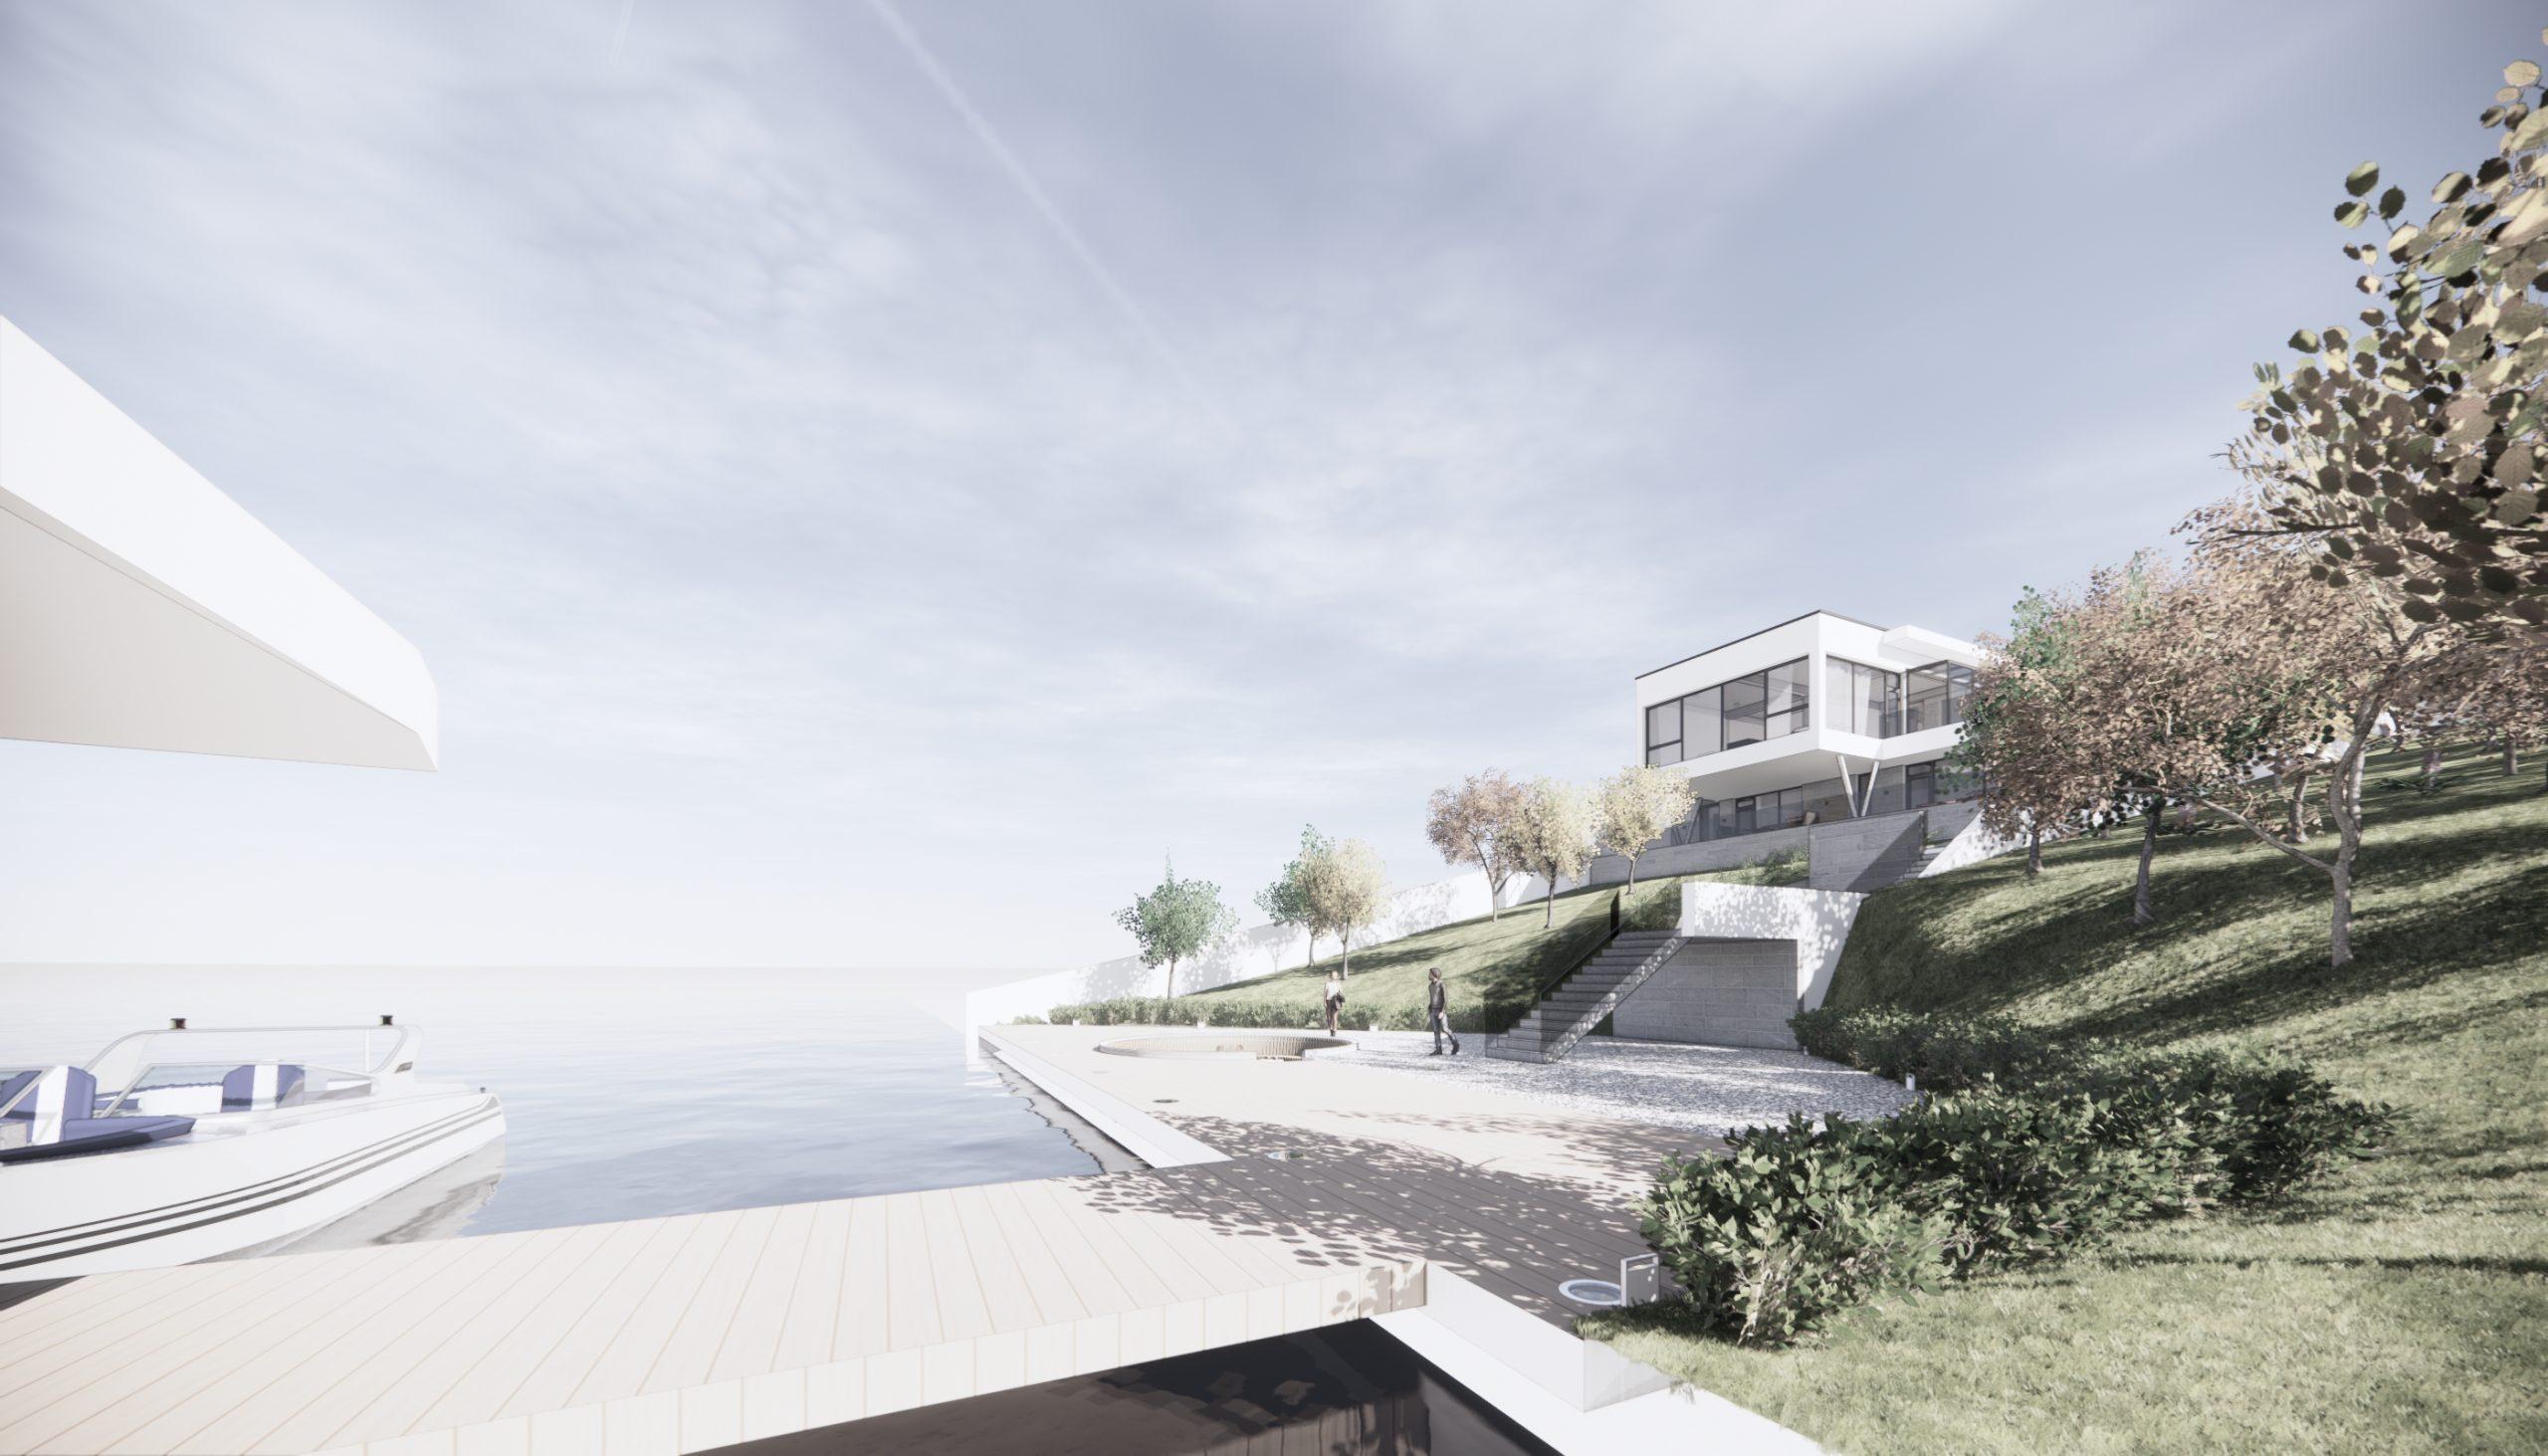 https://nbc-arhitect.ro/wp-content/uploads/2020/11/NBC-Arhitect-_-residential-_-2x-Snagov-_-Snagov-Romania_12-scaled.jpg